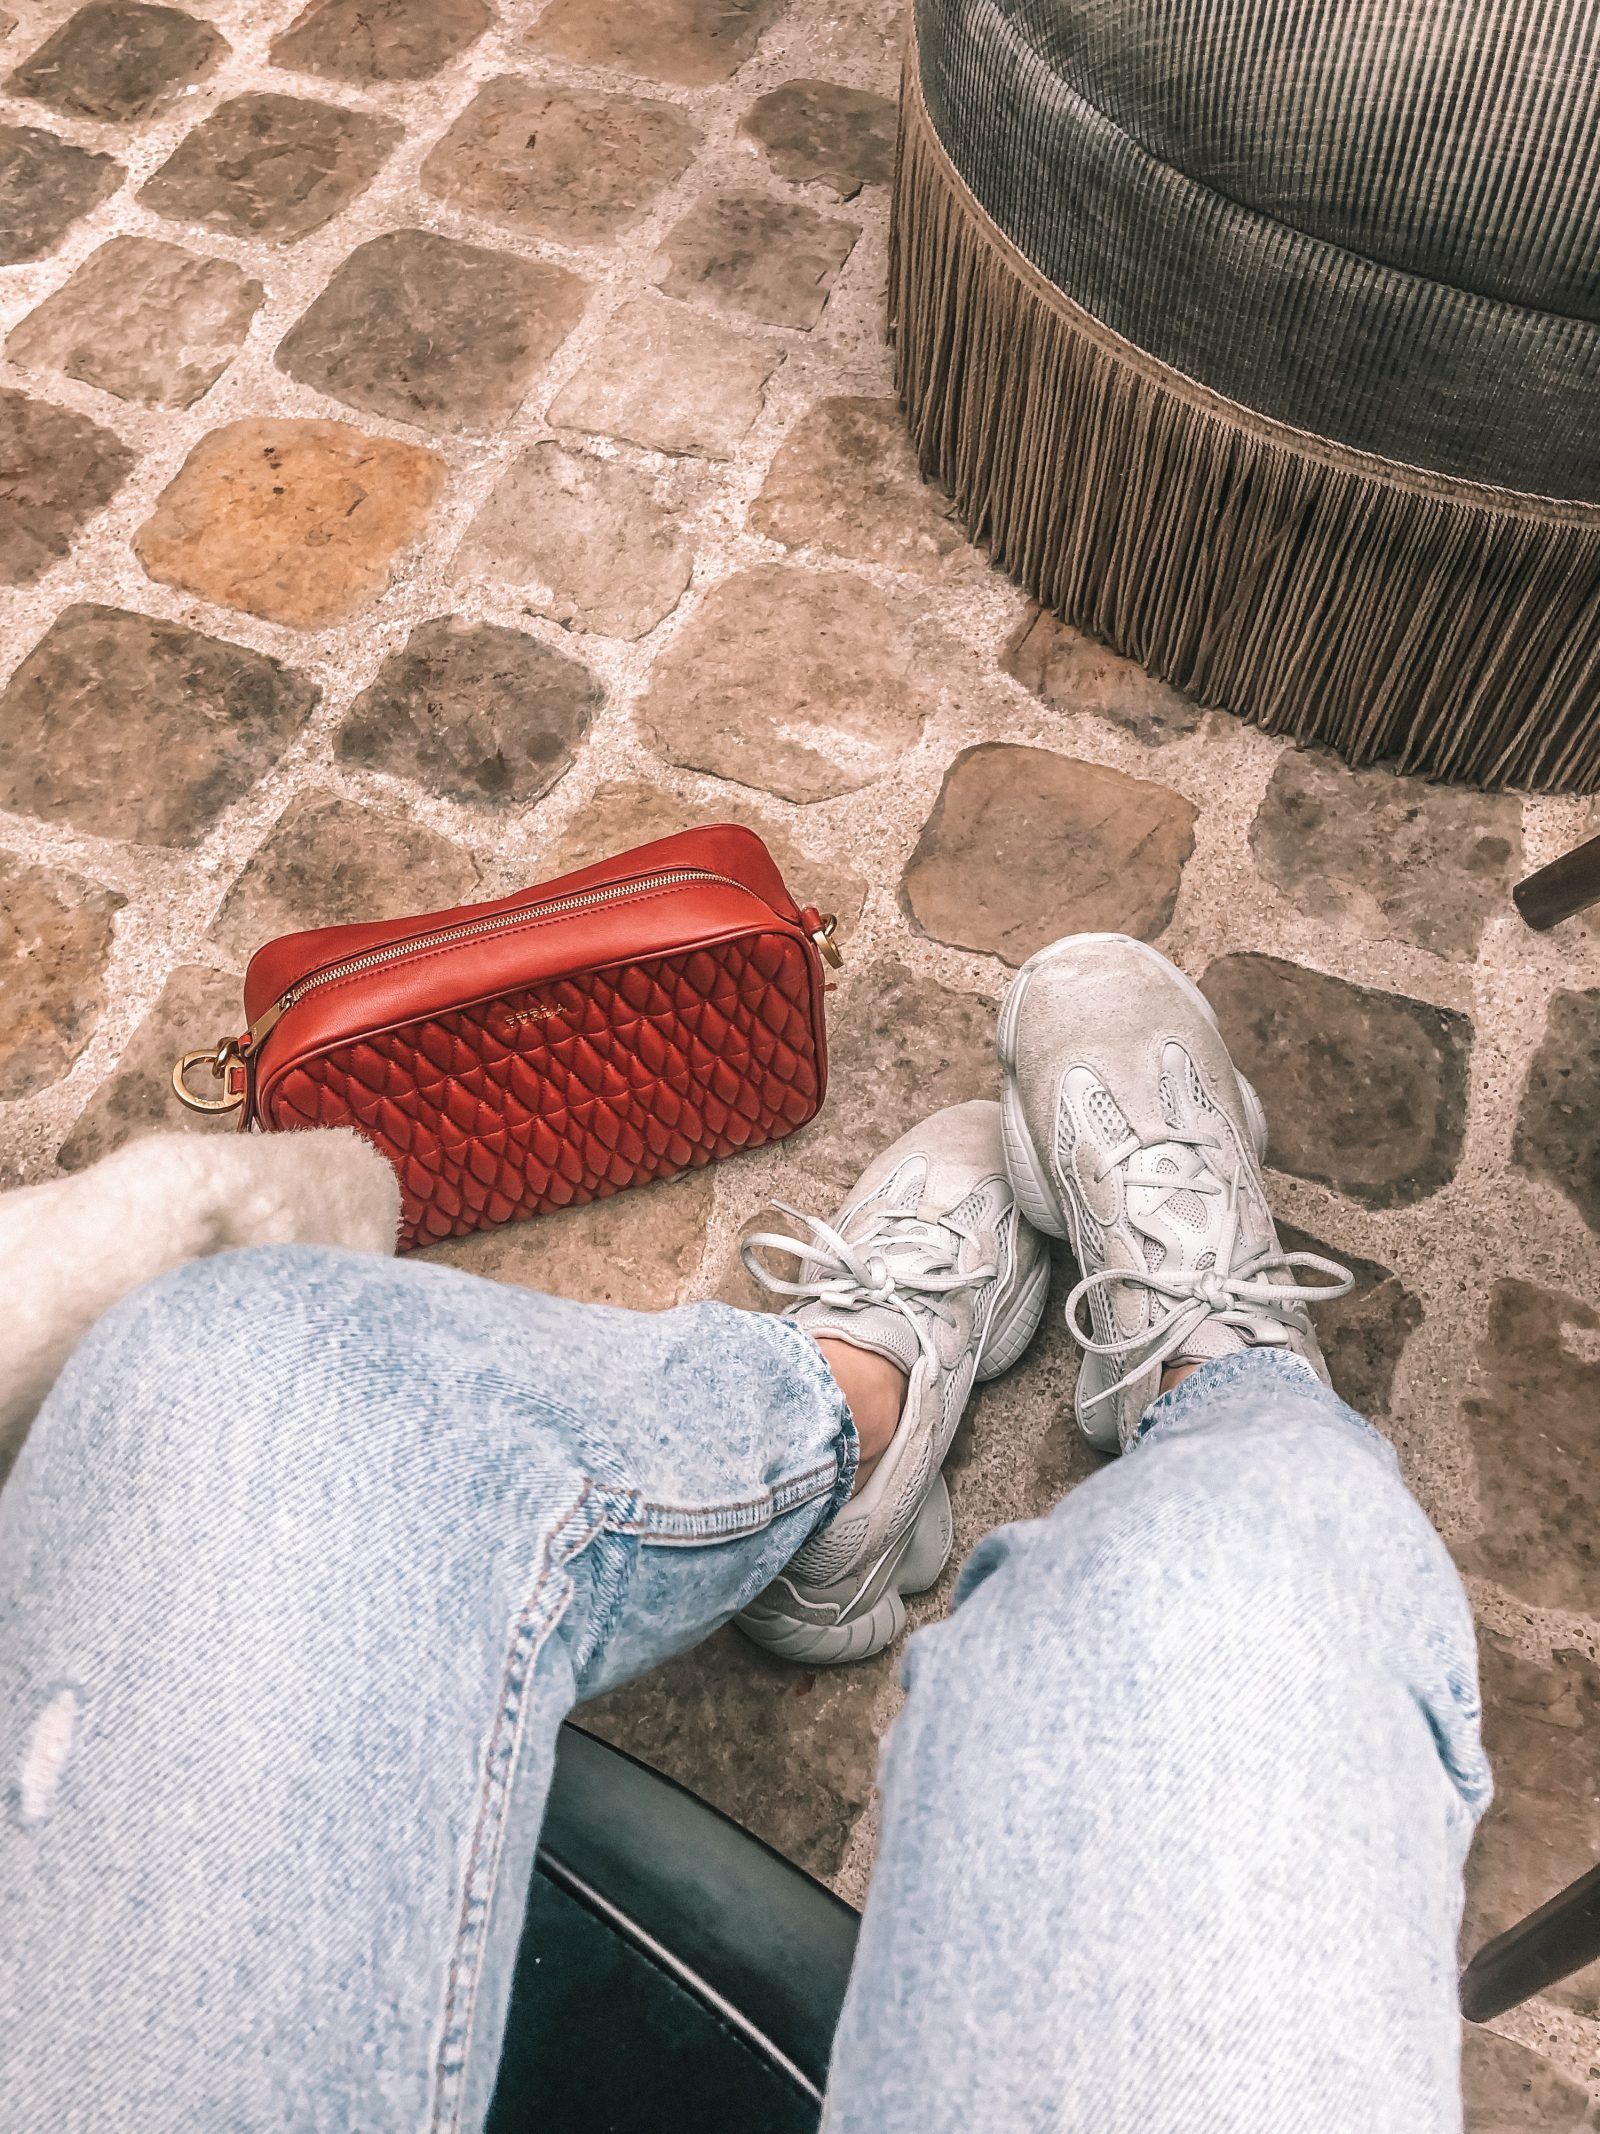 buy popular f7ca8 6cff0 The Adidas Yeezy Mudrat 500 | Style | Yeezy, Yeezy 500, Fashion